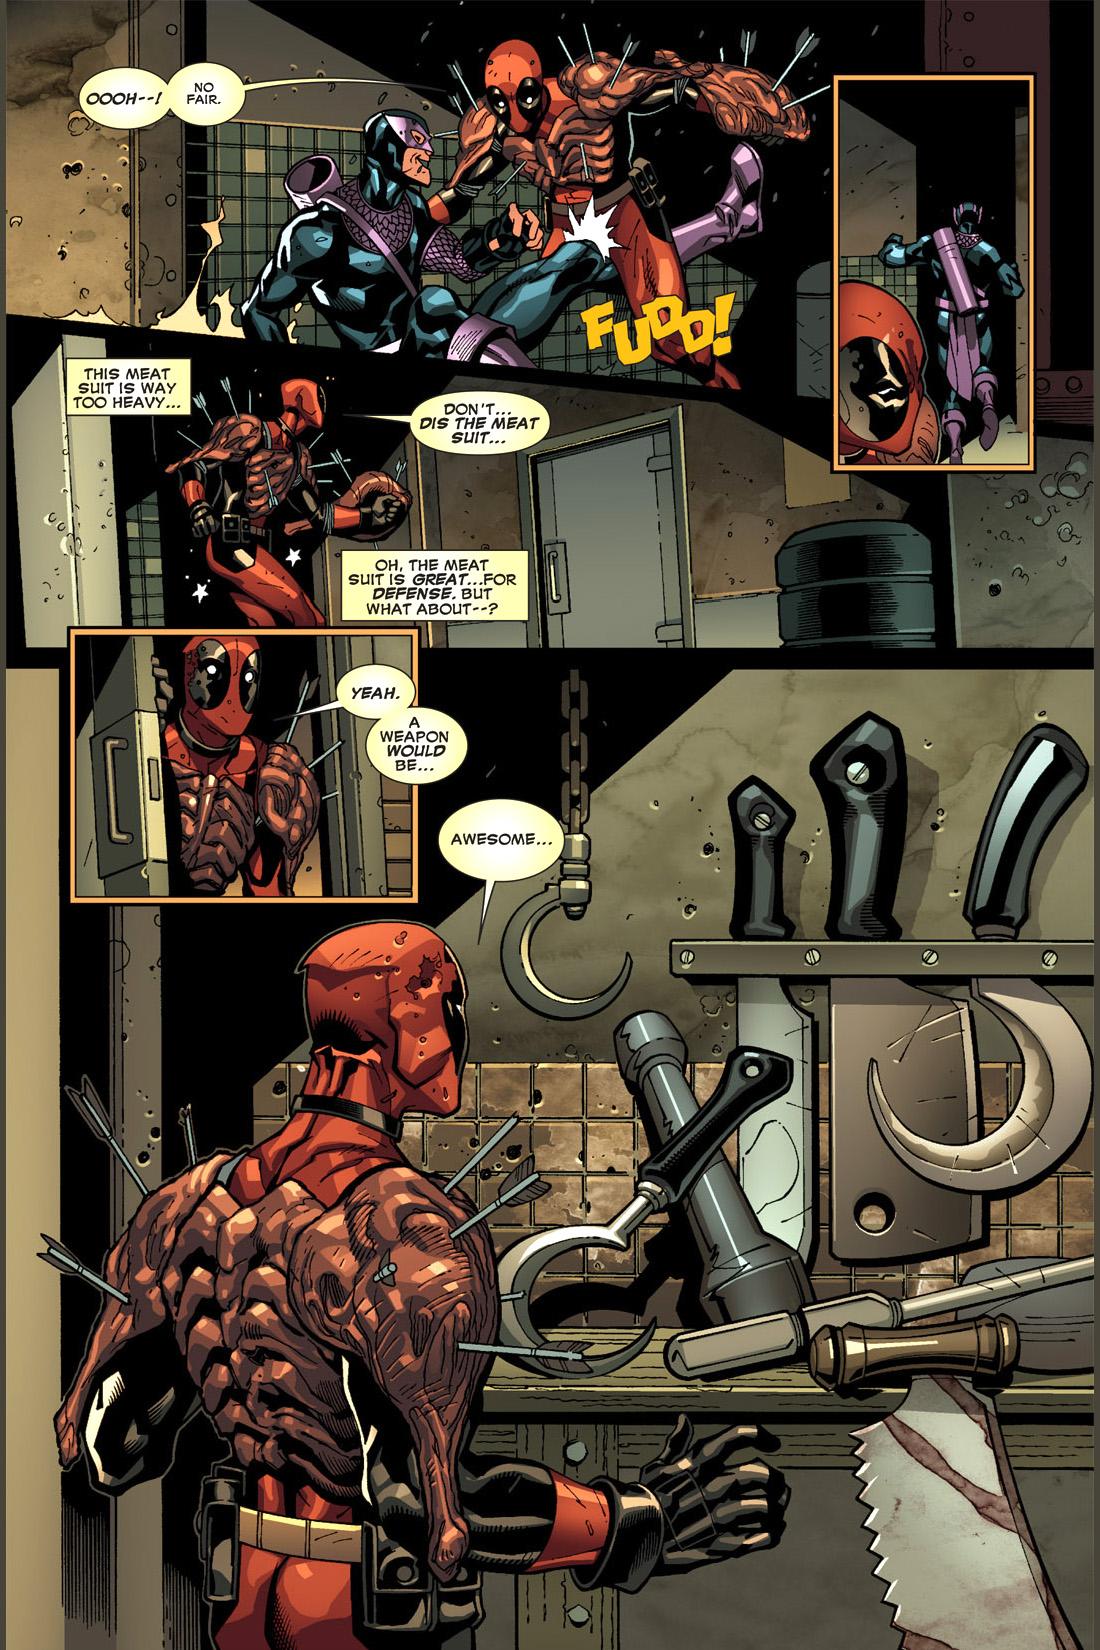 deadpool stabs dark avengers hawkeye